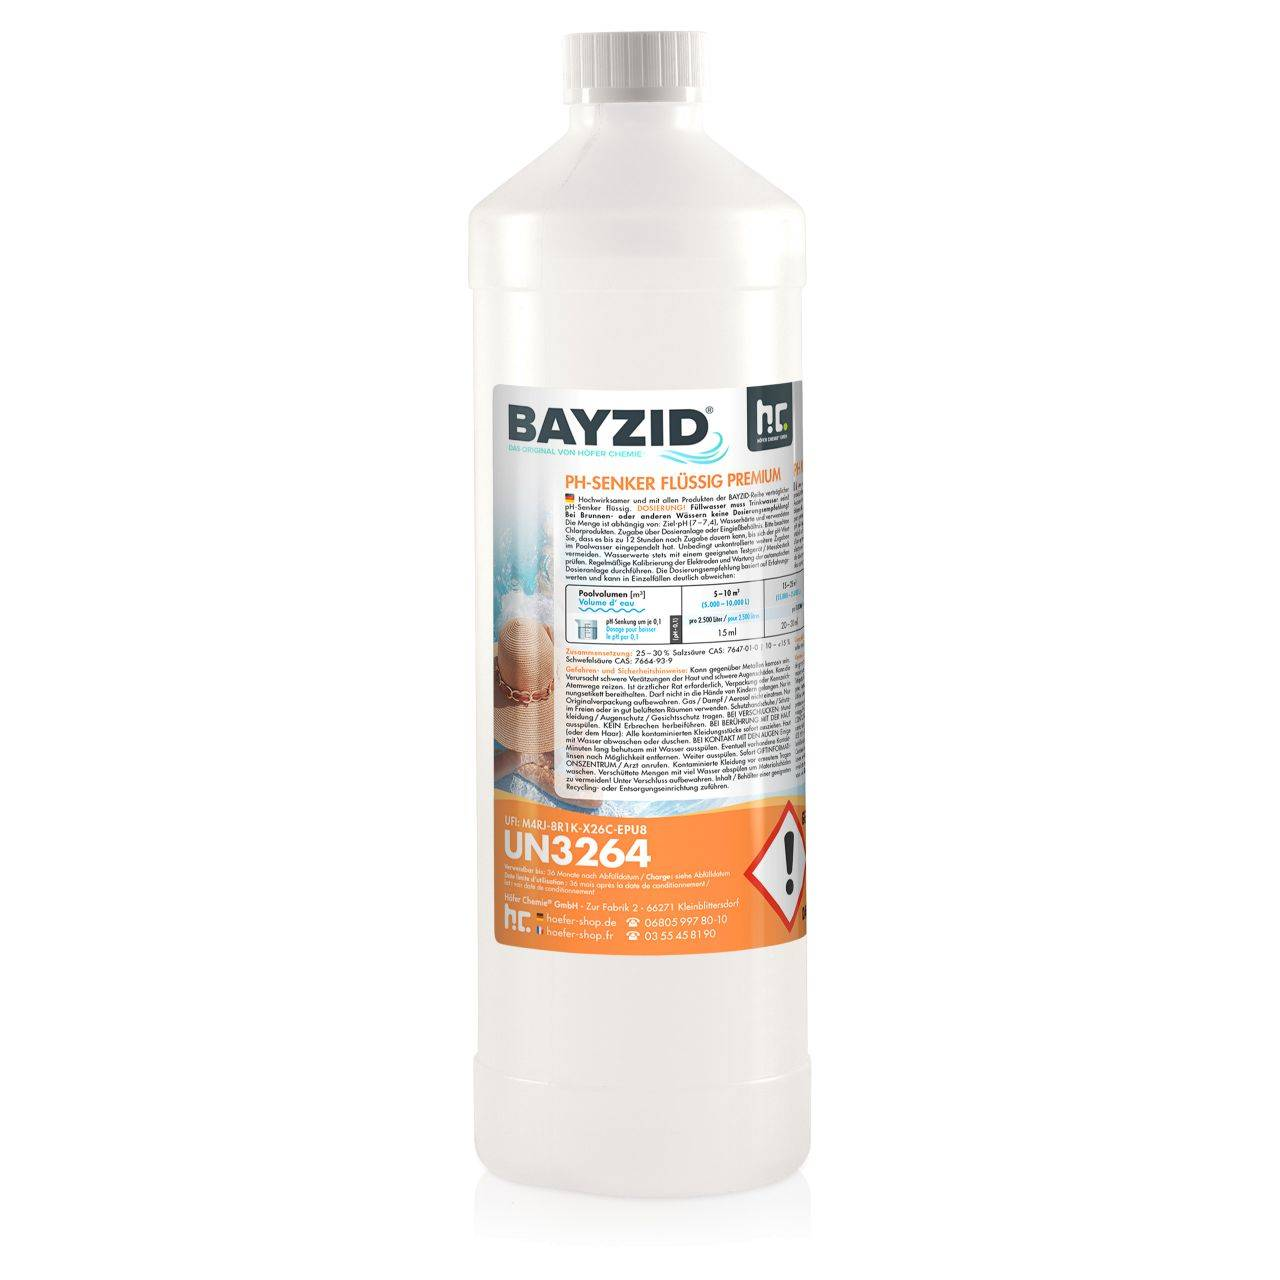 BAYZID 1 kg Bayzid® pH moins liquide (1 x 1 kg)